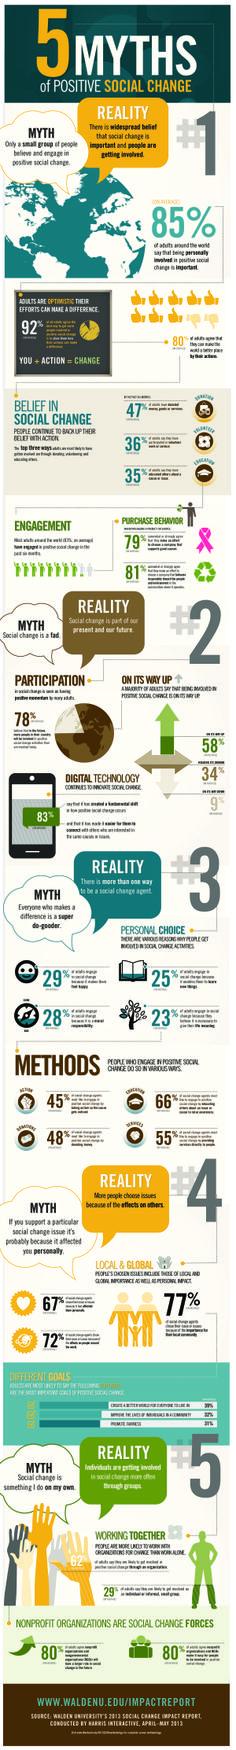 5 Myths Of Positive Social Change